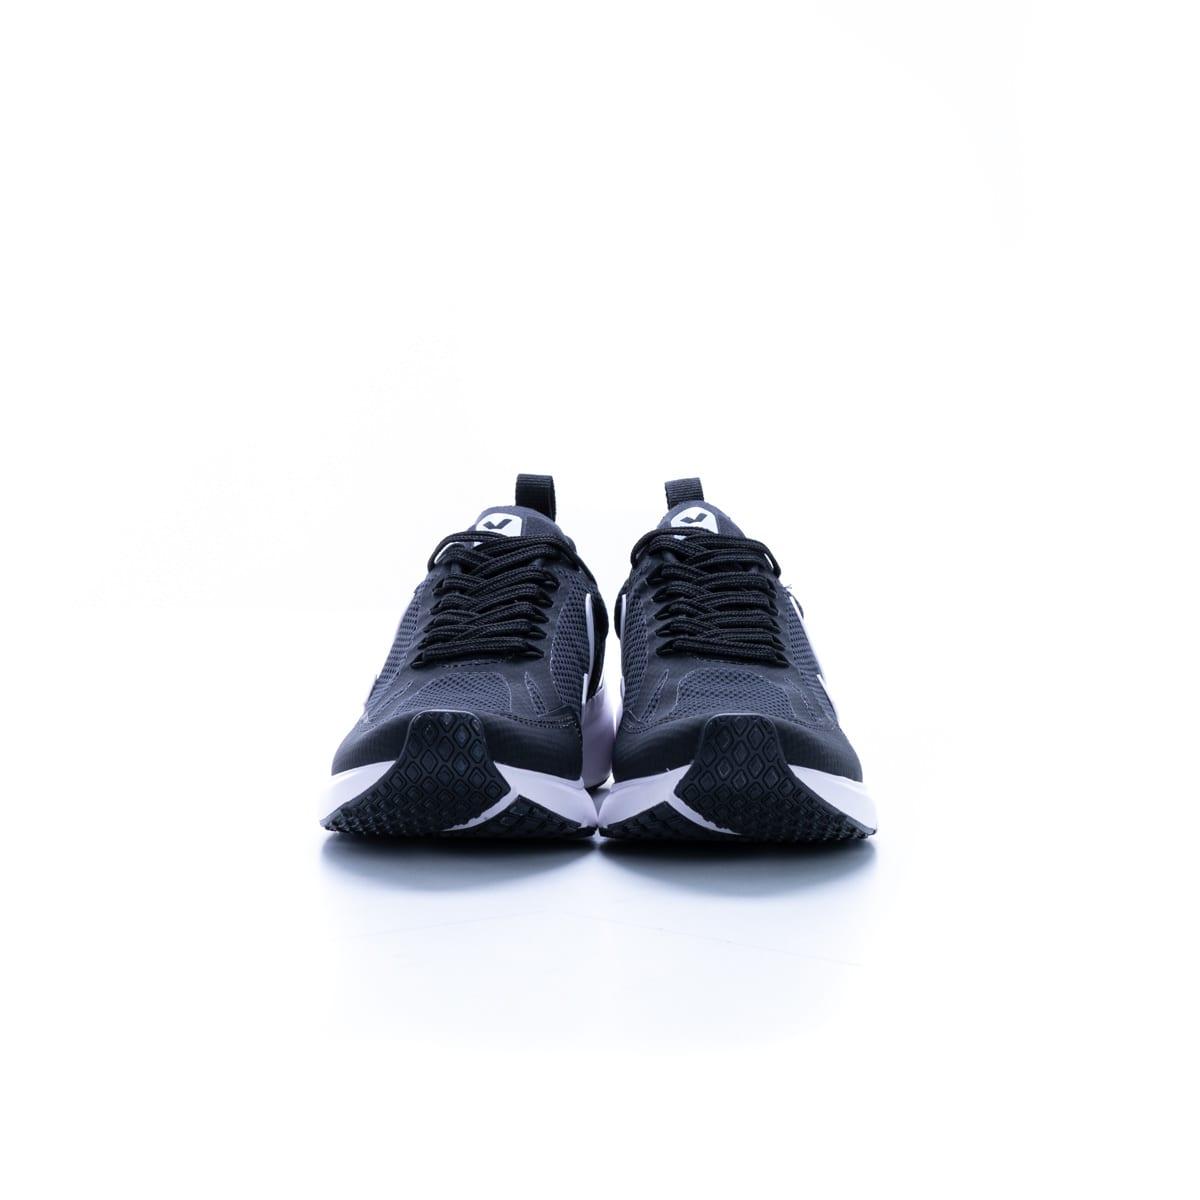 Veja Shoes CONDOR 2 FABRIC SNEAKER